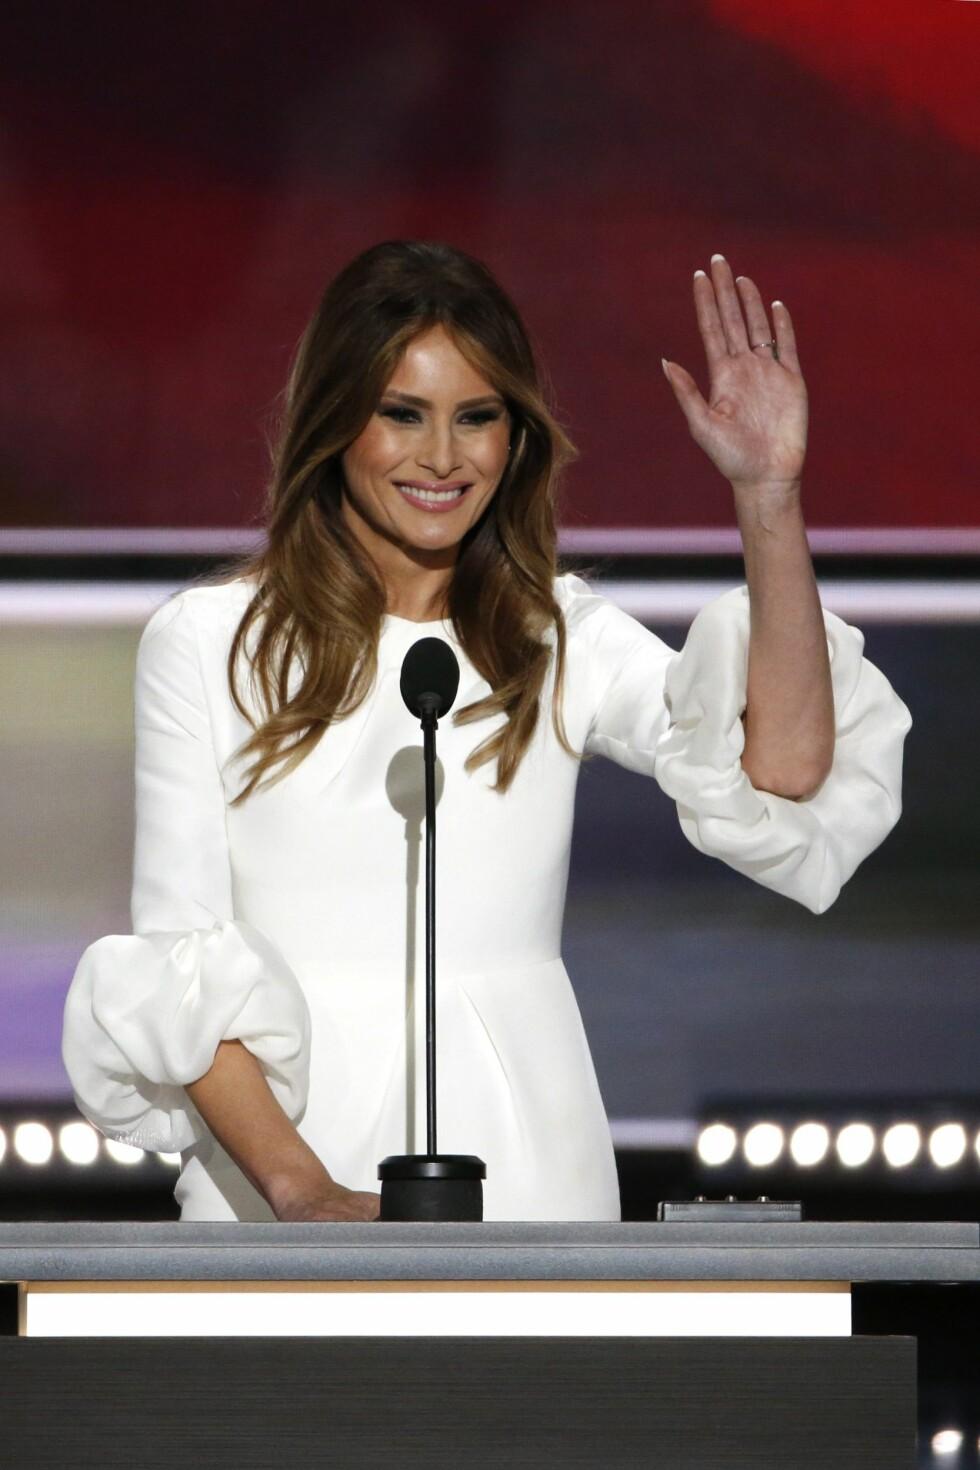 APPLAUS: Melania Trump mottar applaus under Republican National Convention i Cleveland, Ohio.